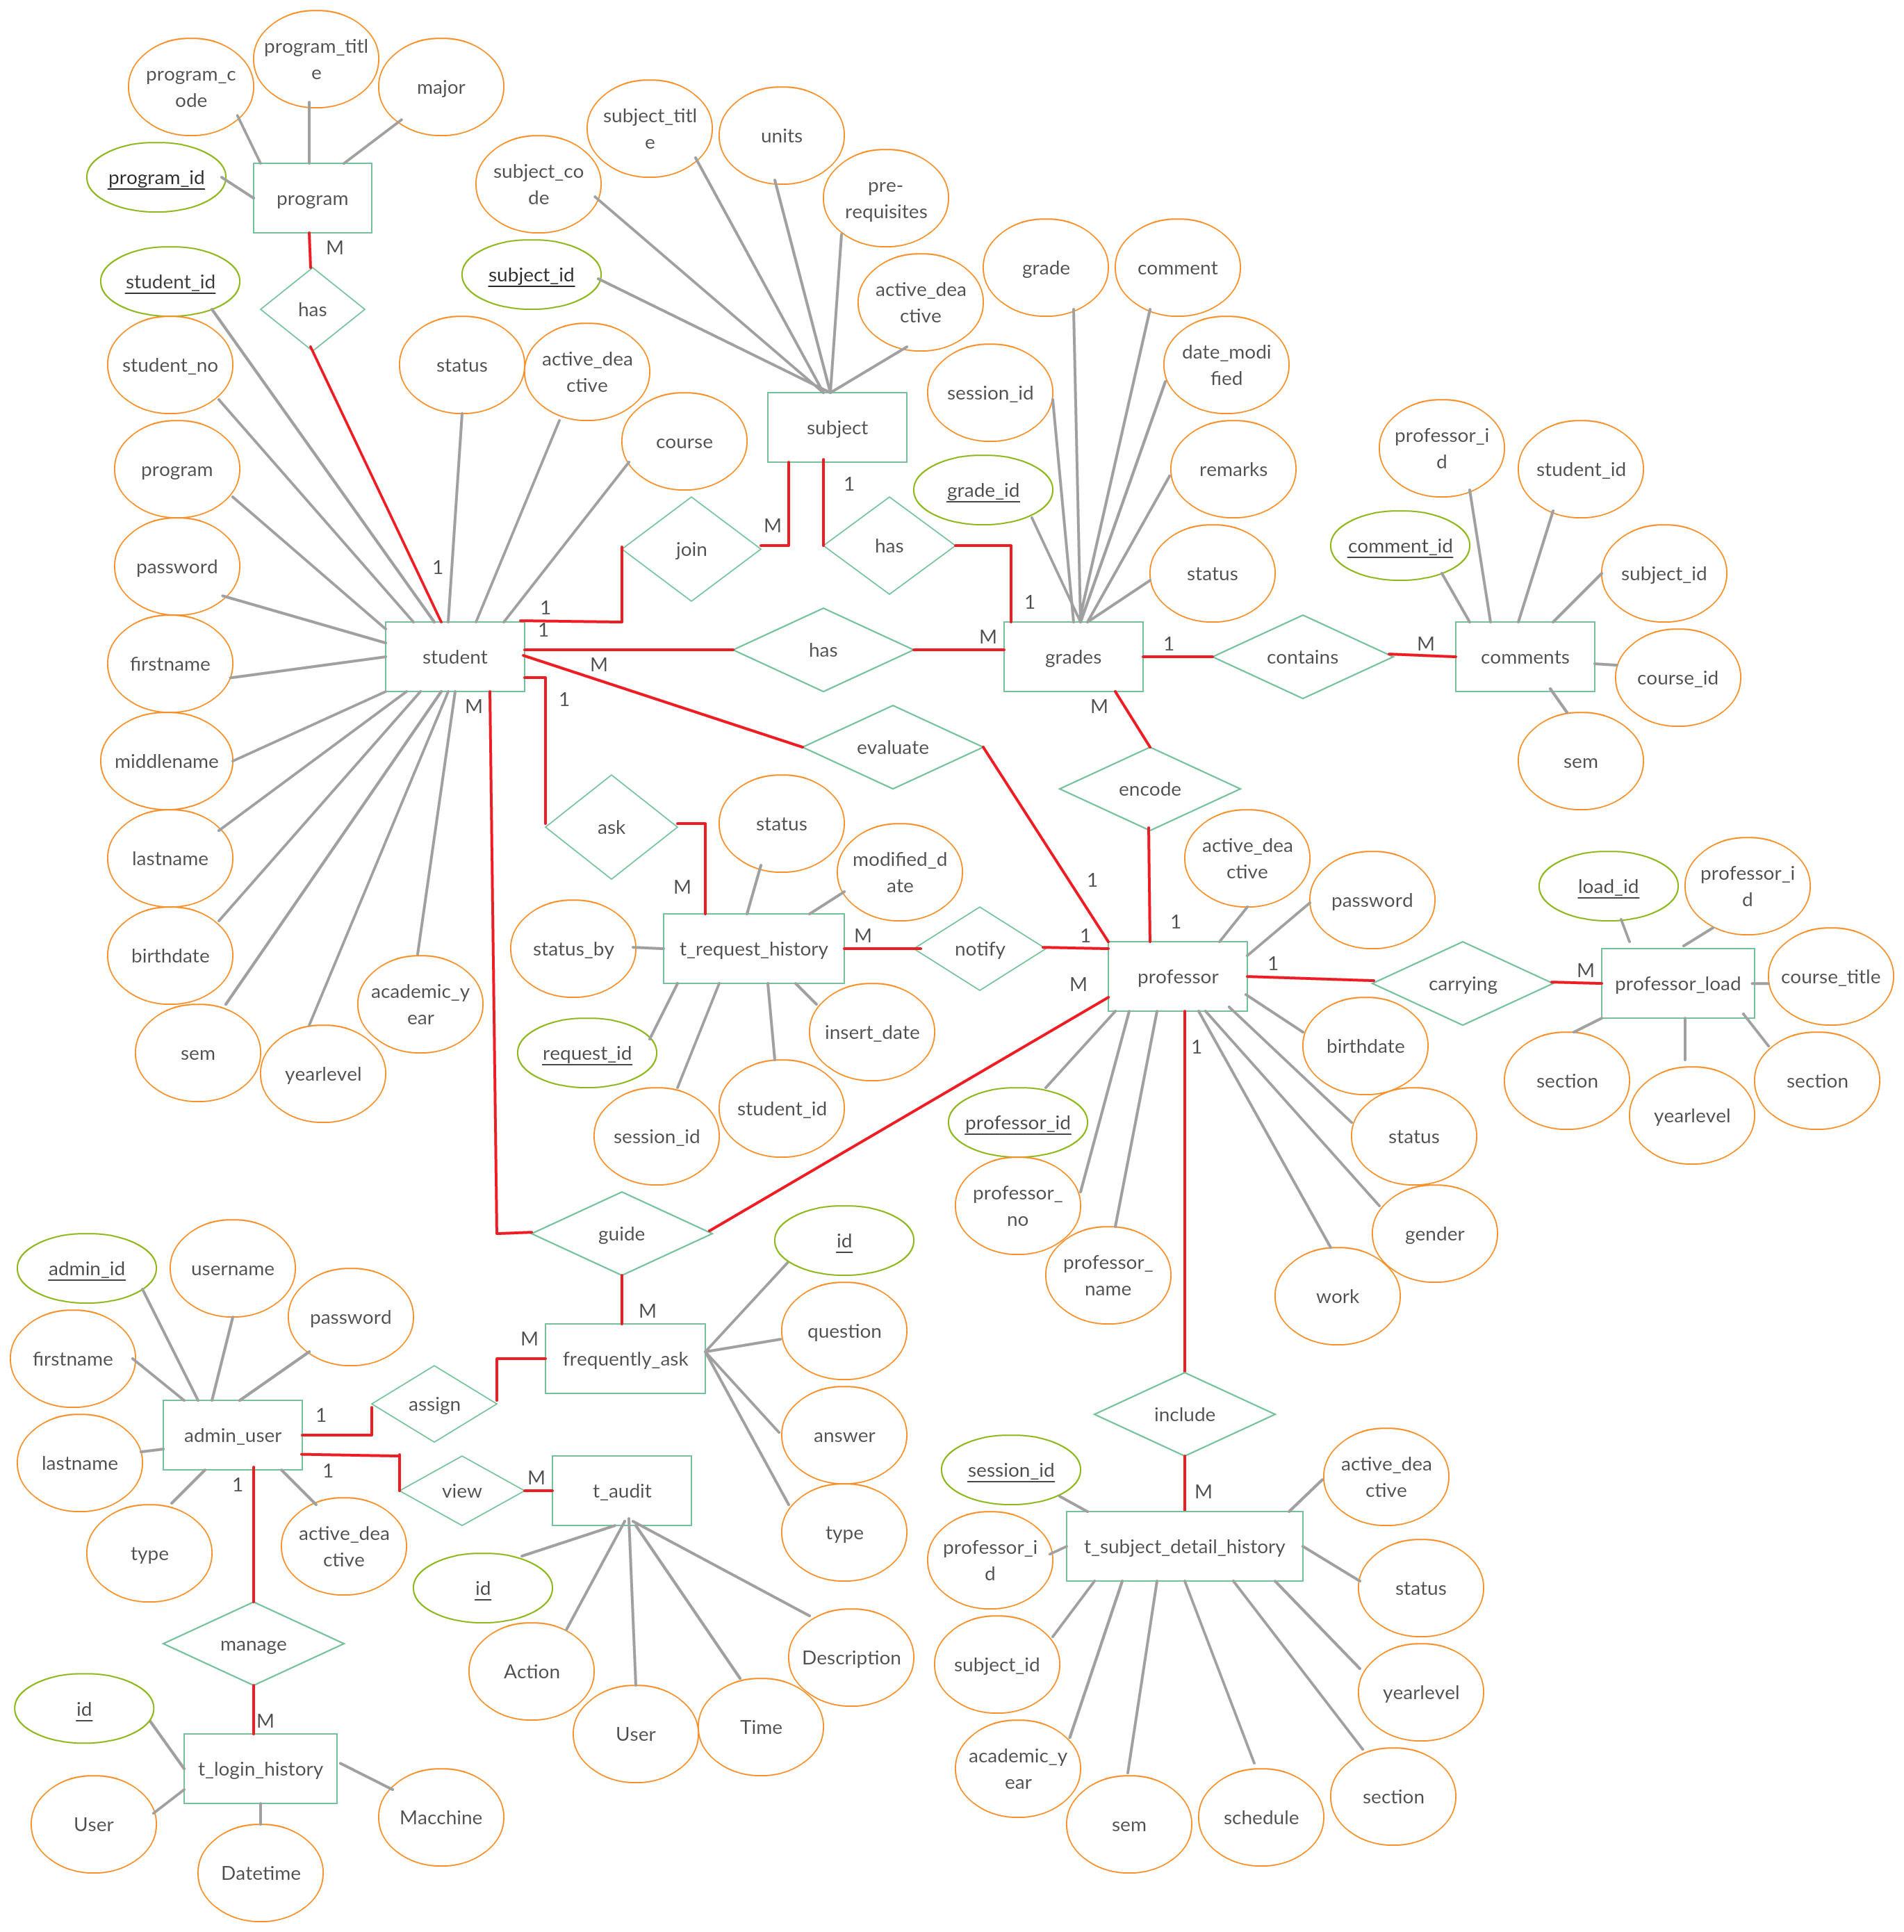 Entity Relationship Diagram (Er Diagram) Of Online Student pertaining to Er Diagram Uml Tutorial